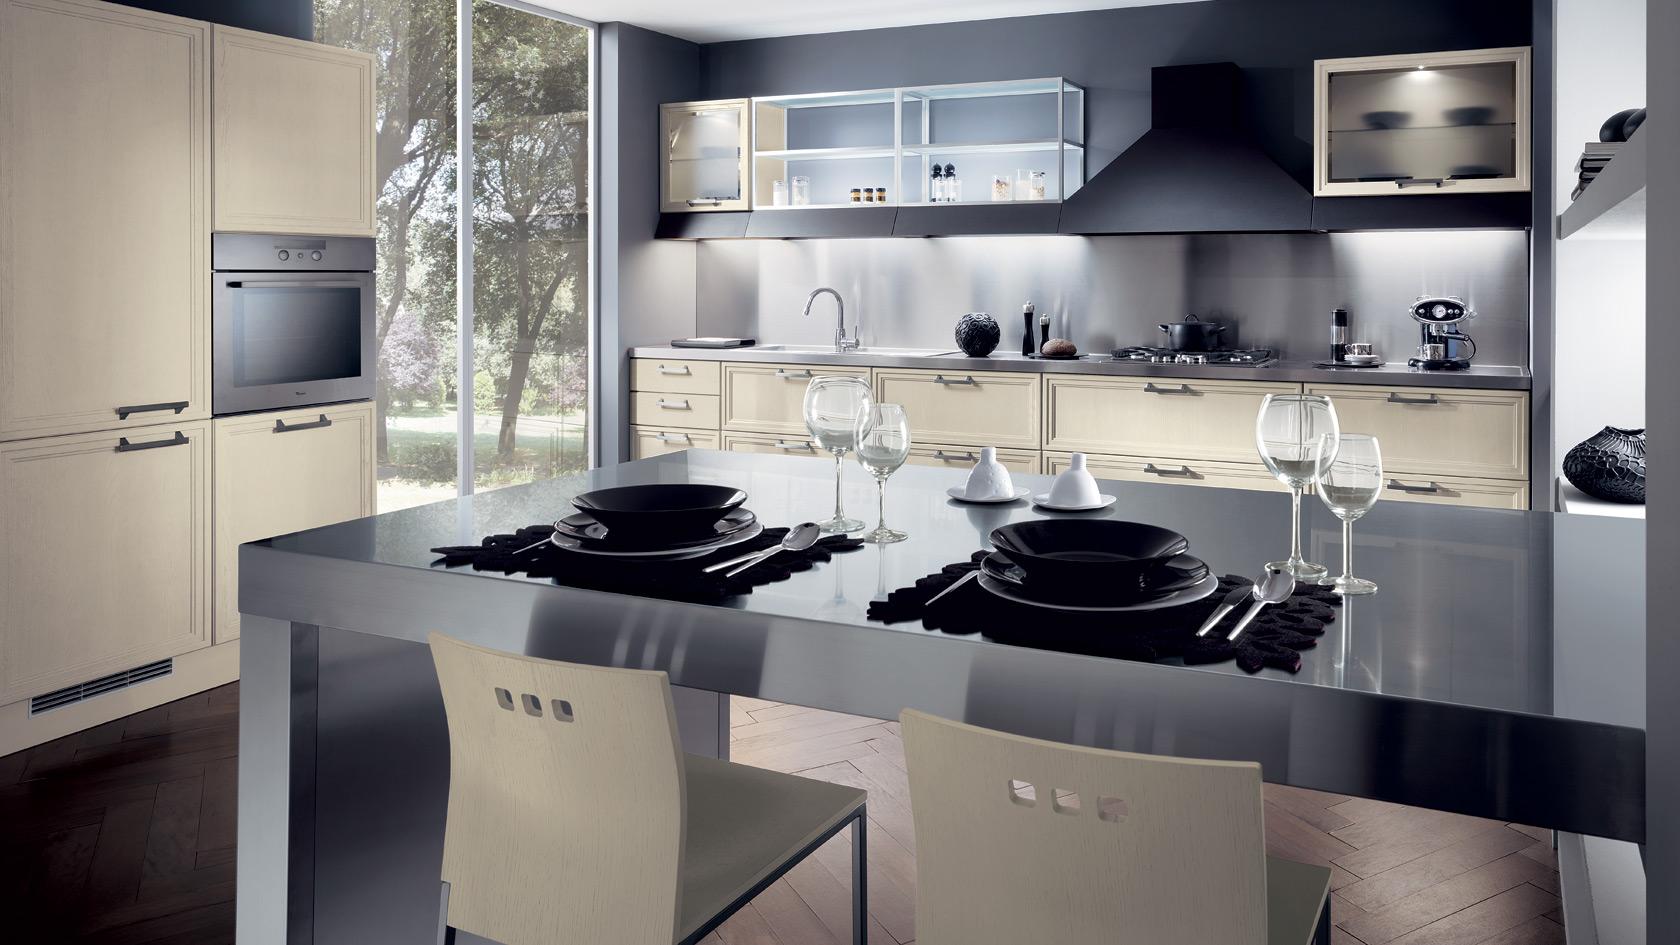 Cucina Moderna Scavolini Focus-mobili incardone